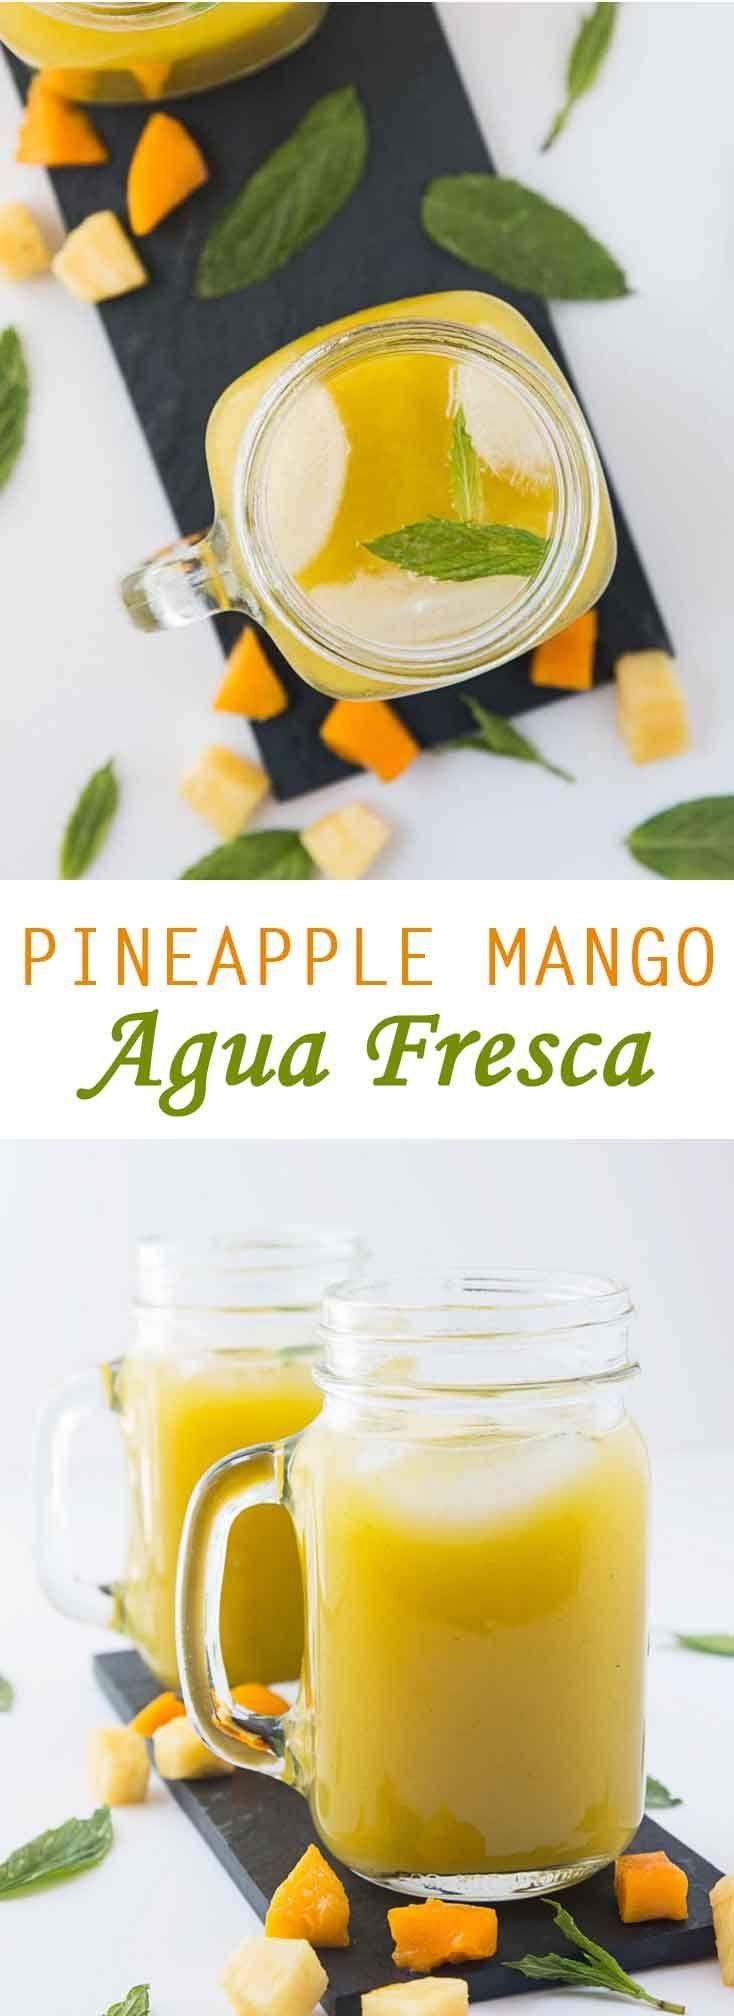 Pineapple Mango Agua Fresca Recipe #vegan #glutenfree #healthy | Vegetarian Gastronomy | www.VegetarianGastronomy.com